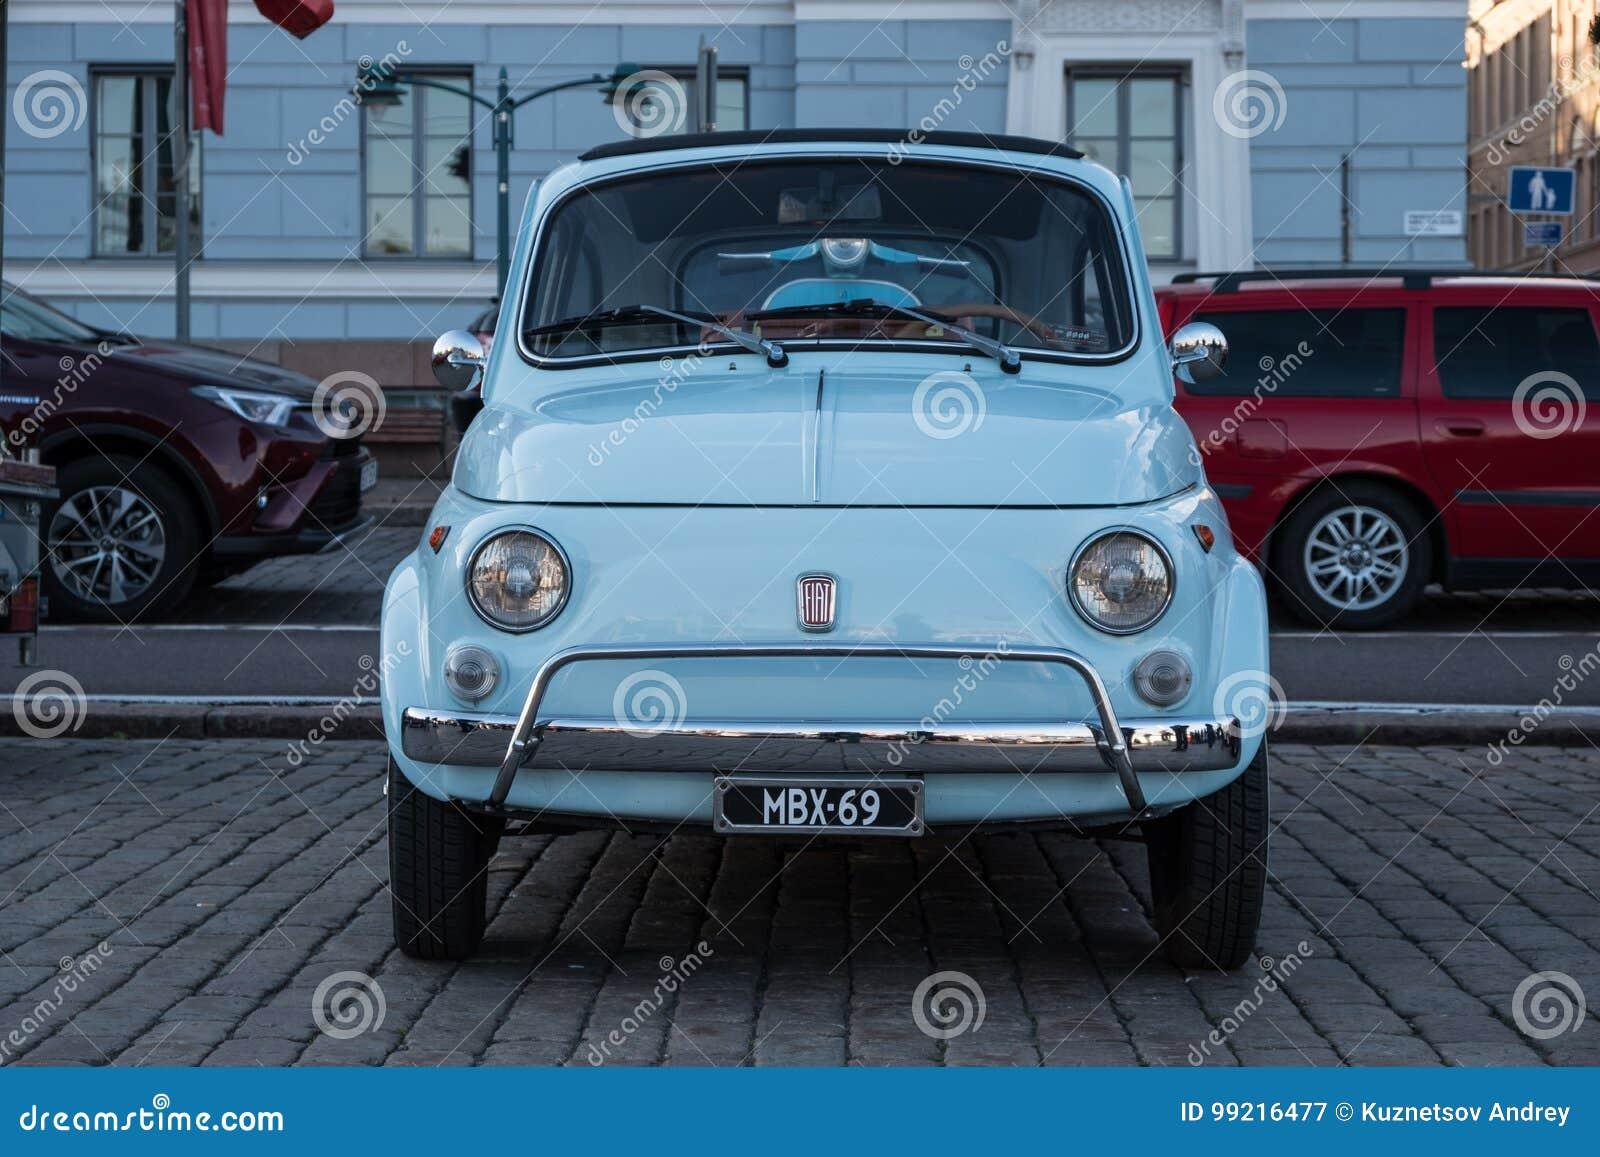 Helsinki Finland Old Car Fiat 500l Editorial Photography Image Of Retro Festival 99216477